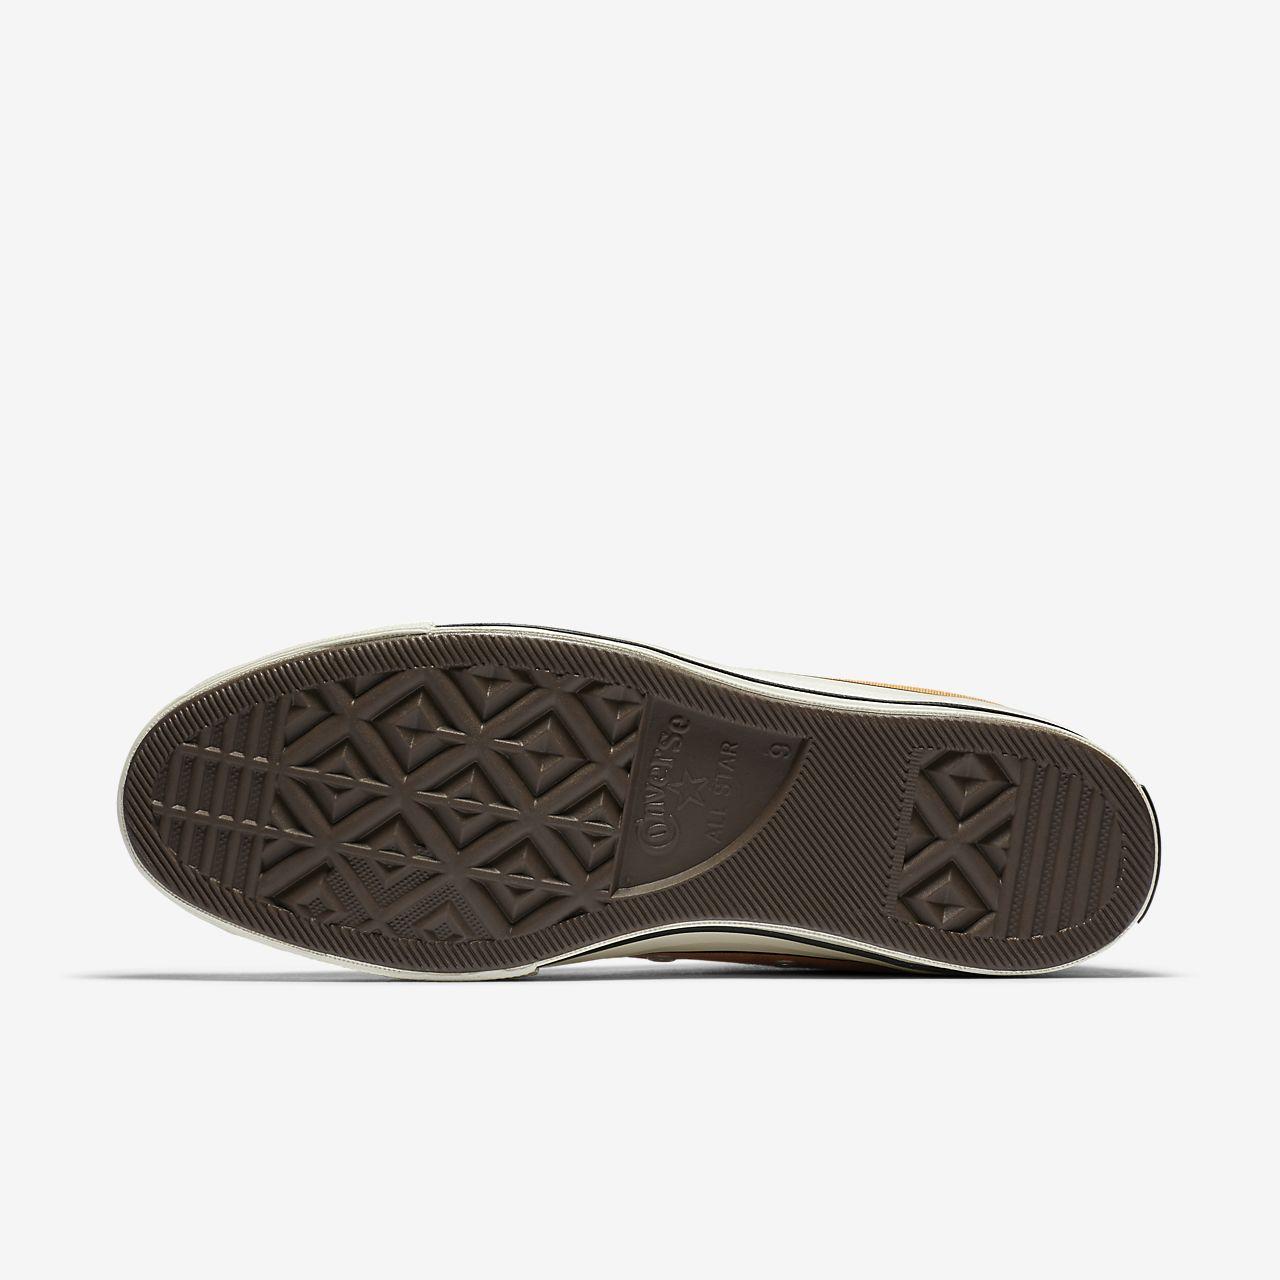 ... Converse Chuck 70 Vintage Canvas High Top Men's Shoe